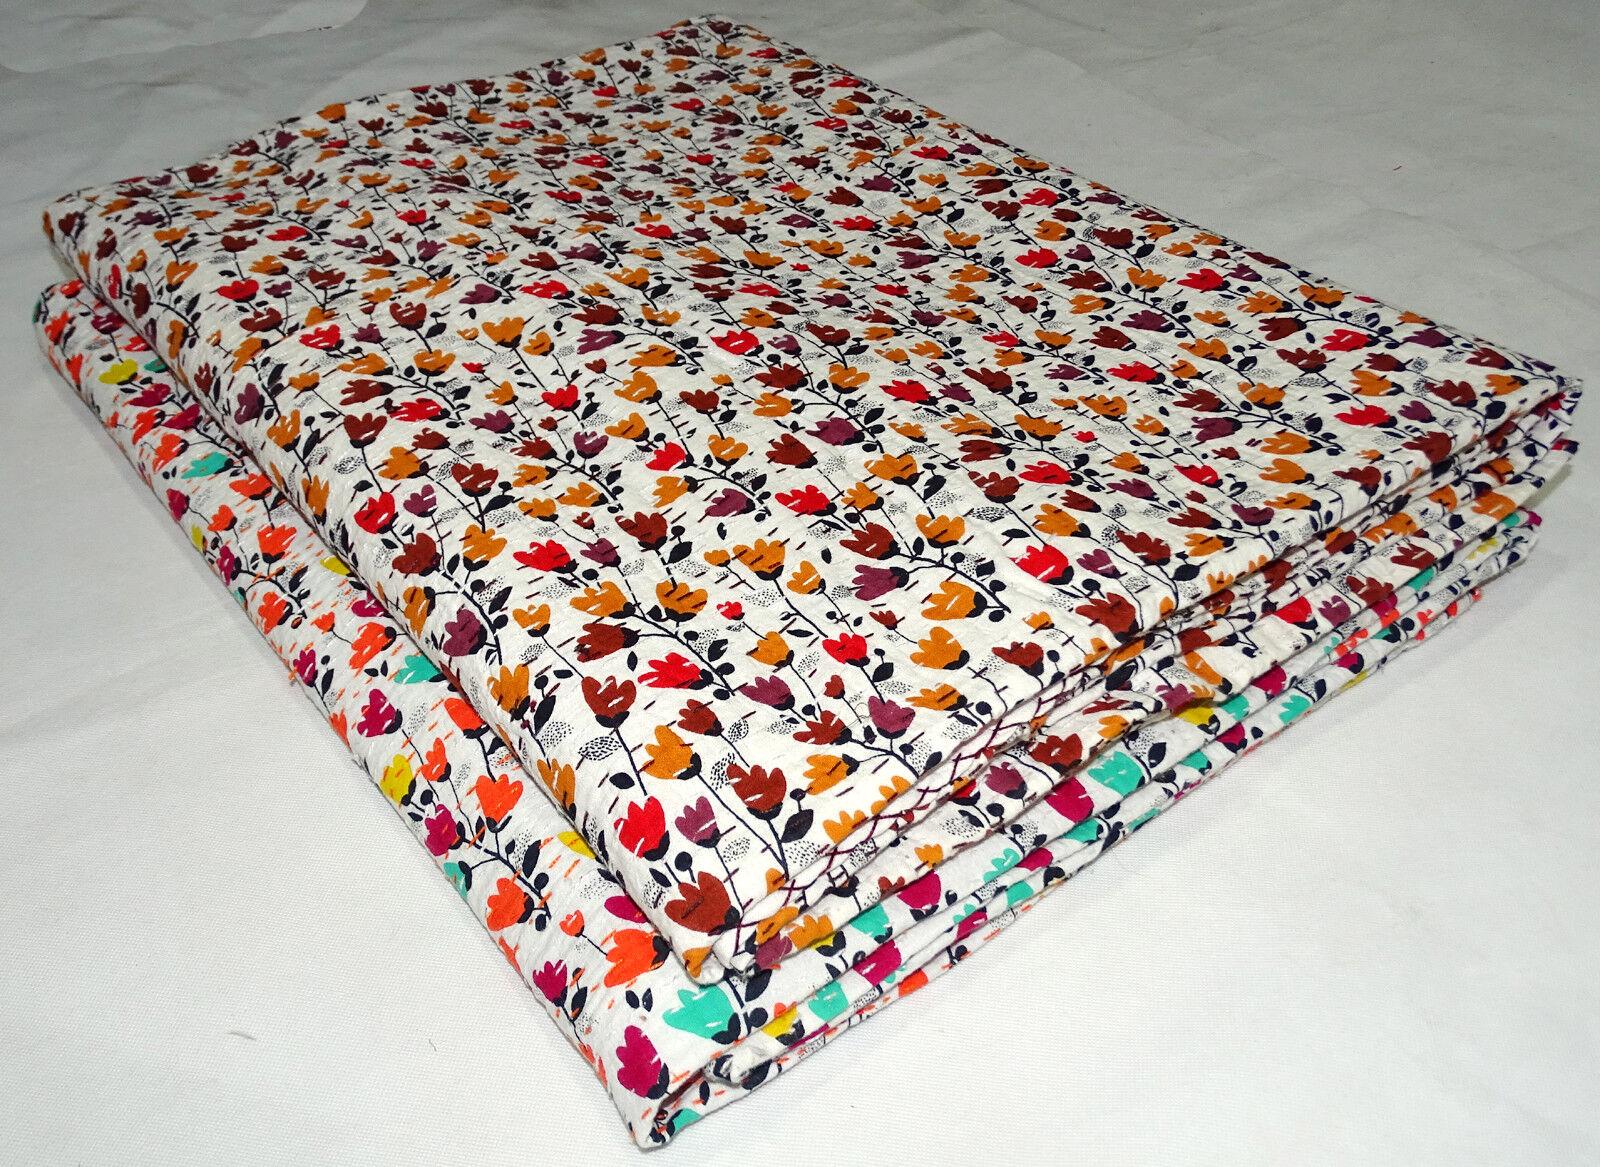 5Pc Lot Single Size Kantha Quilt Bedsheet Small Floral Print Bedspread Gudari